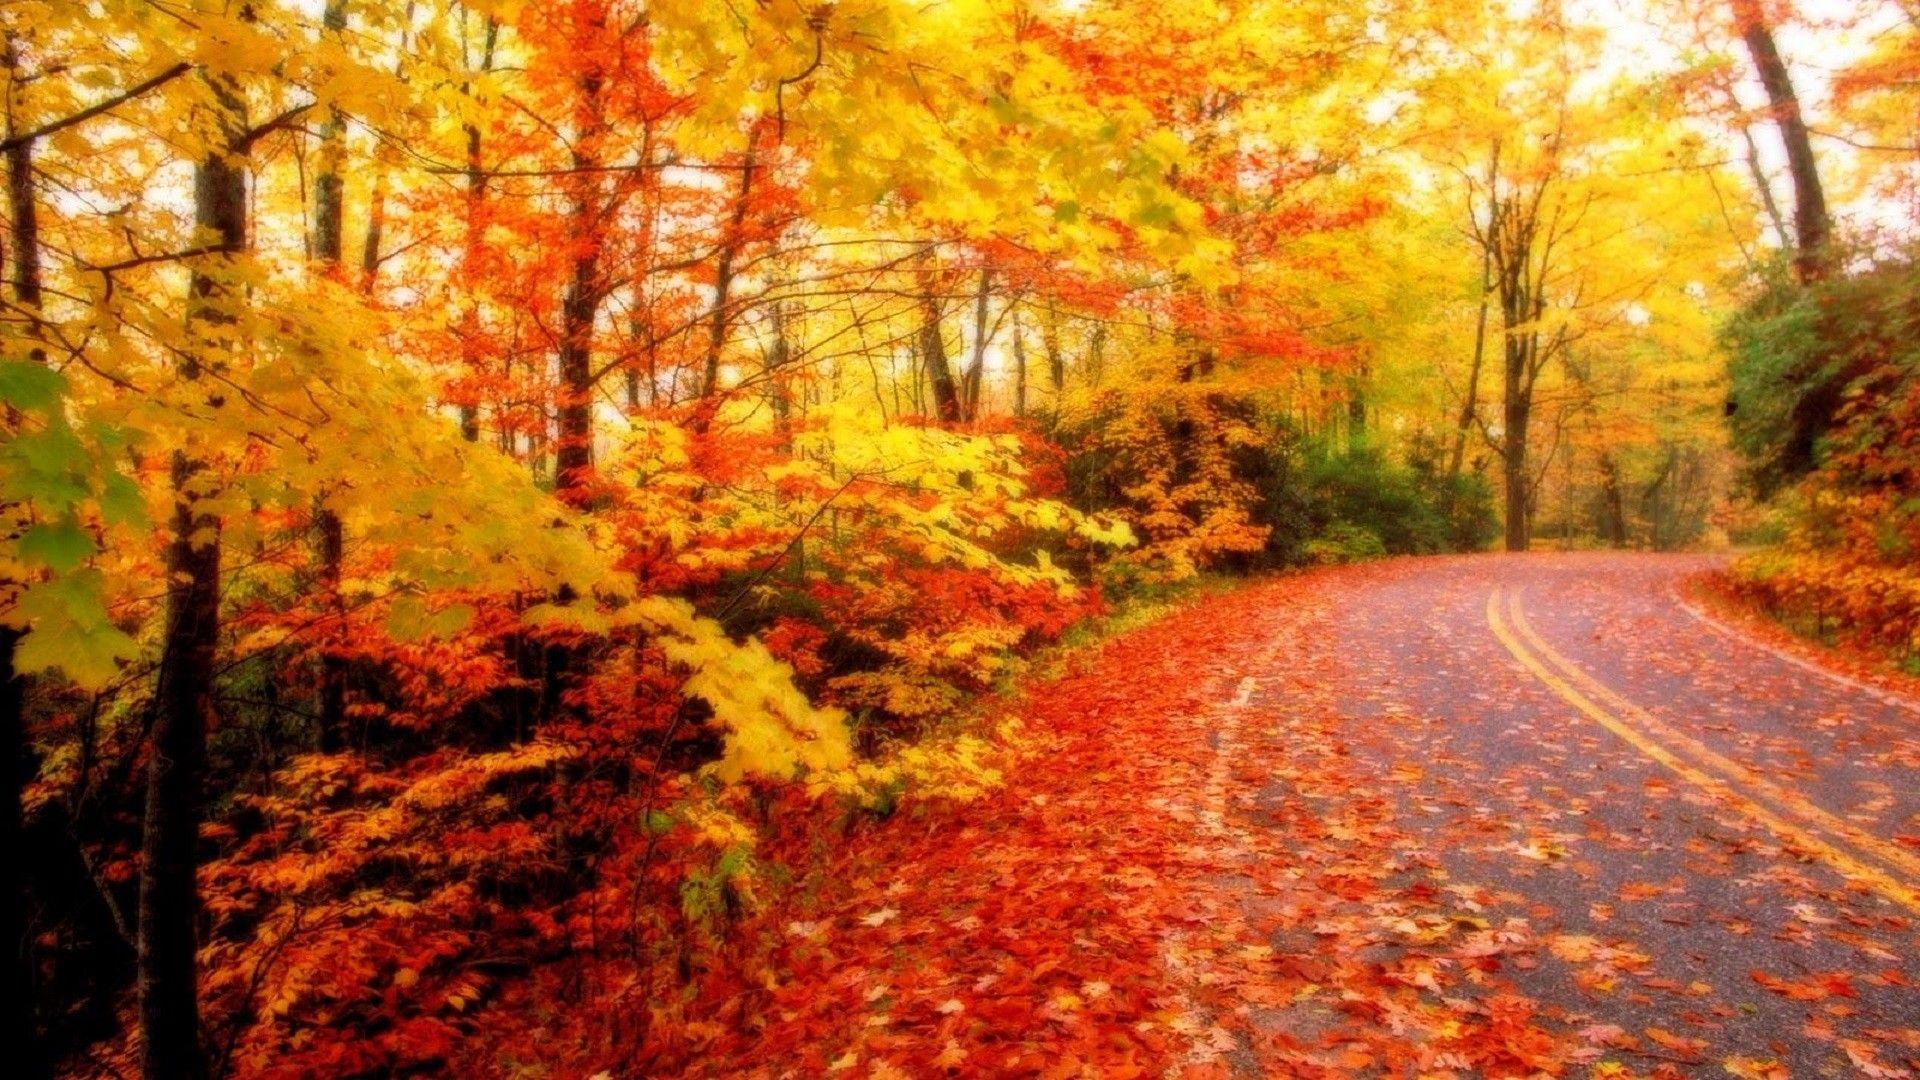 Autumn Season Wallpapers Top Free Autumn Season Backgrounds Wallpaperaccess